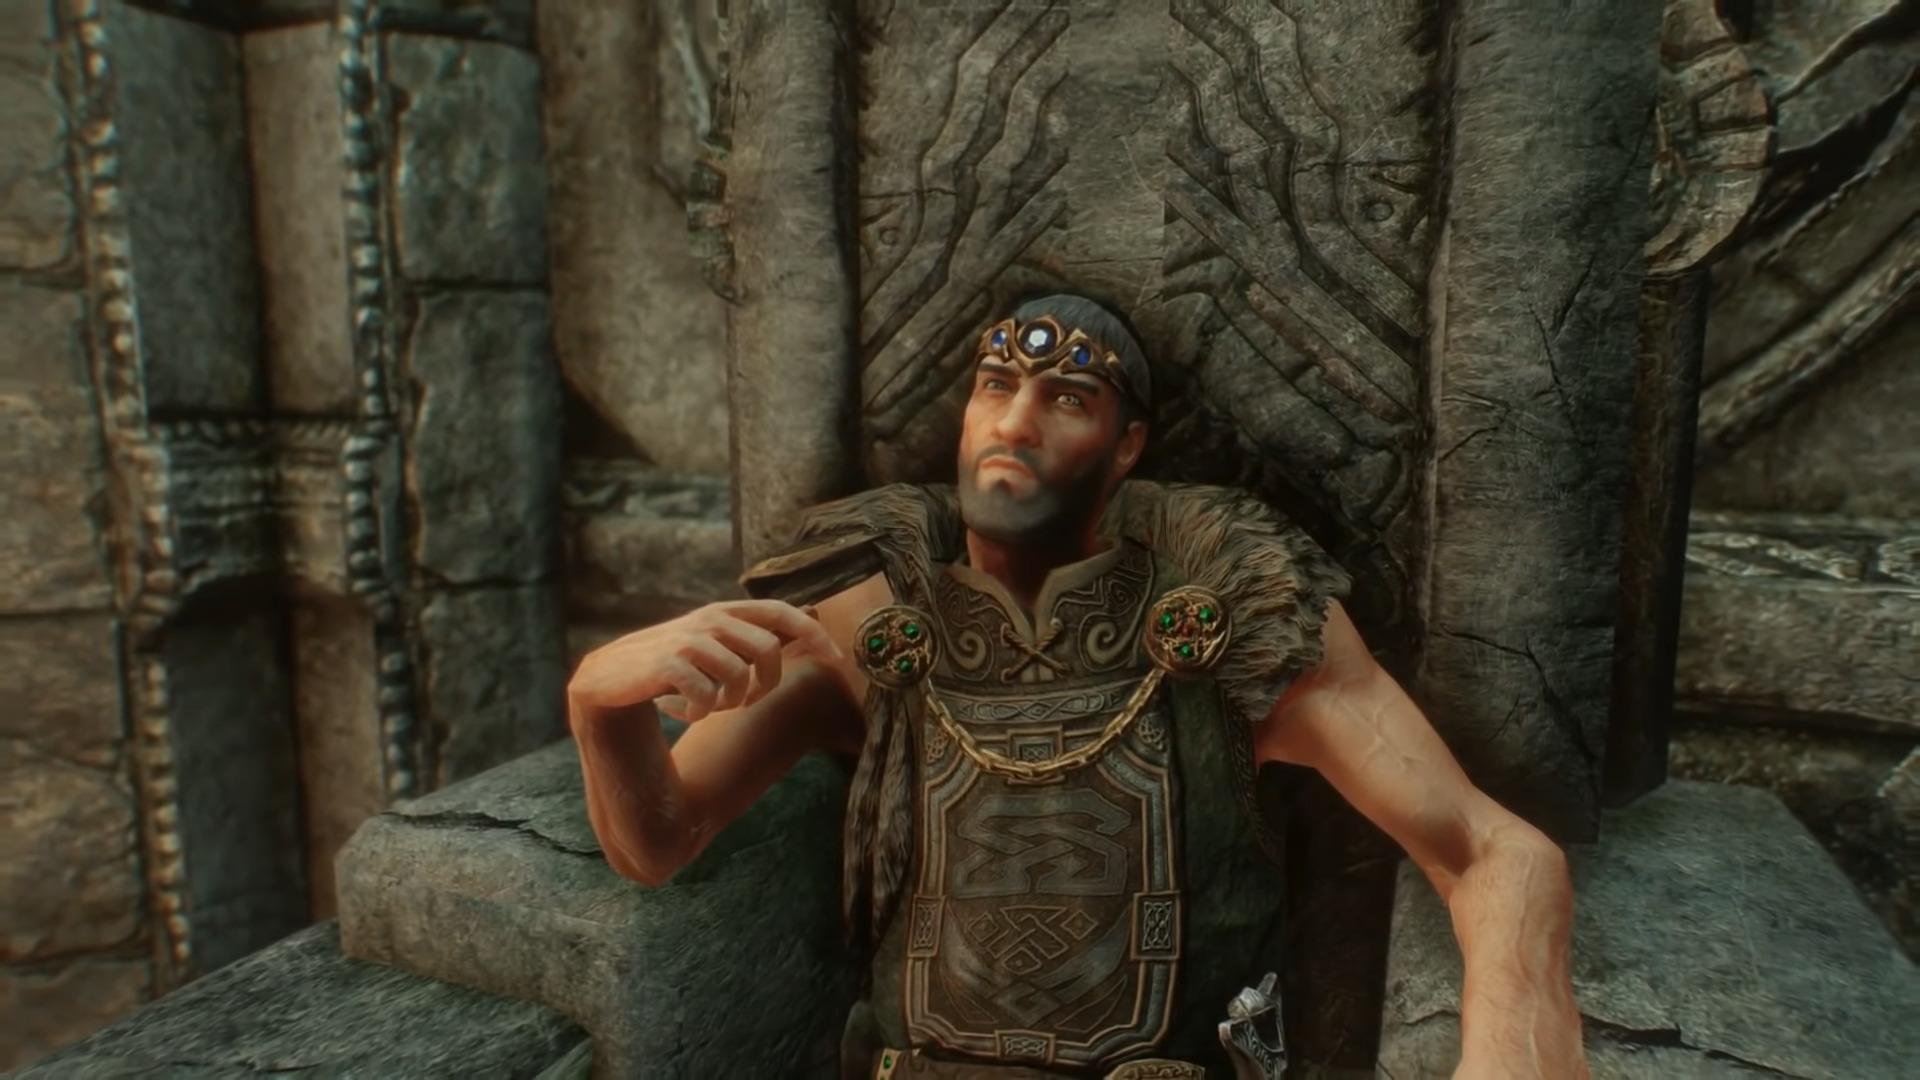 Elder Scrolls 5 Skyrim Special Edition: Weekly Mod Showcase 12/12 Features Modular Clothing And True Thane Mods